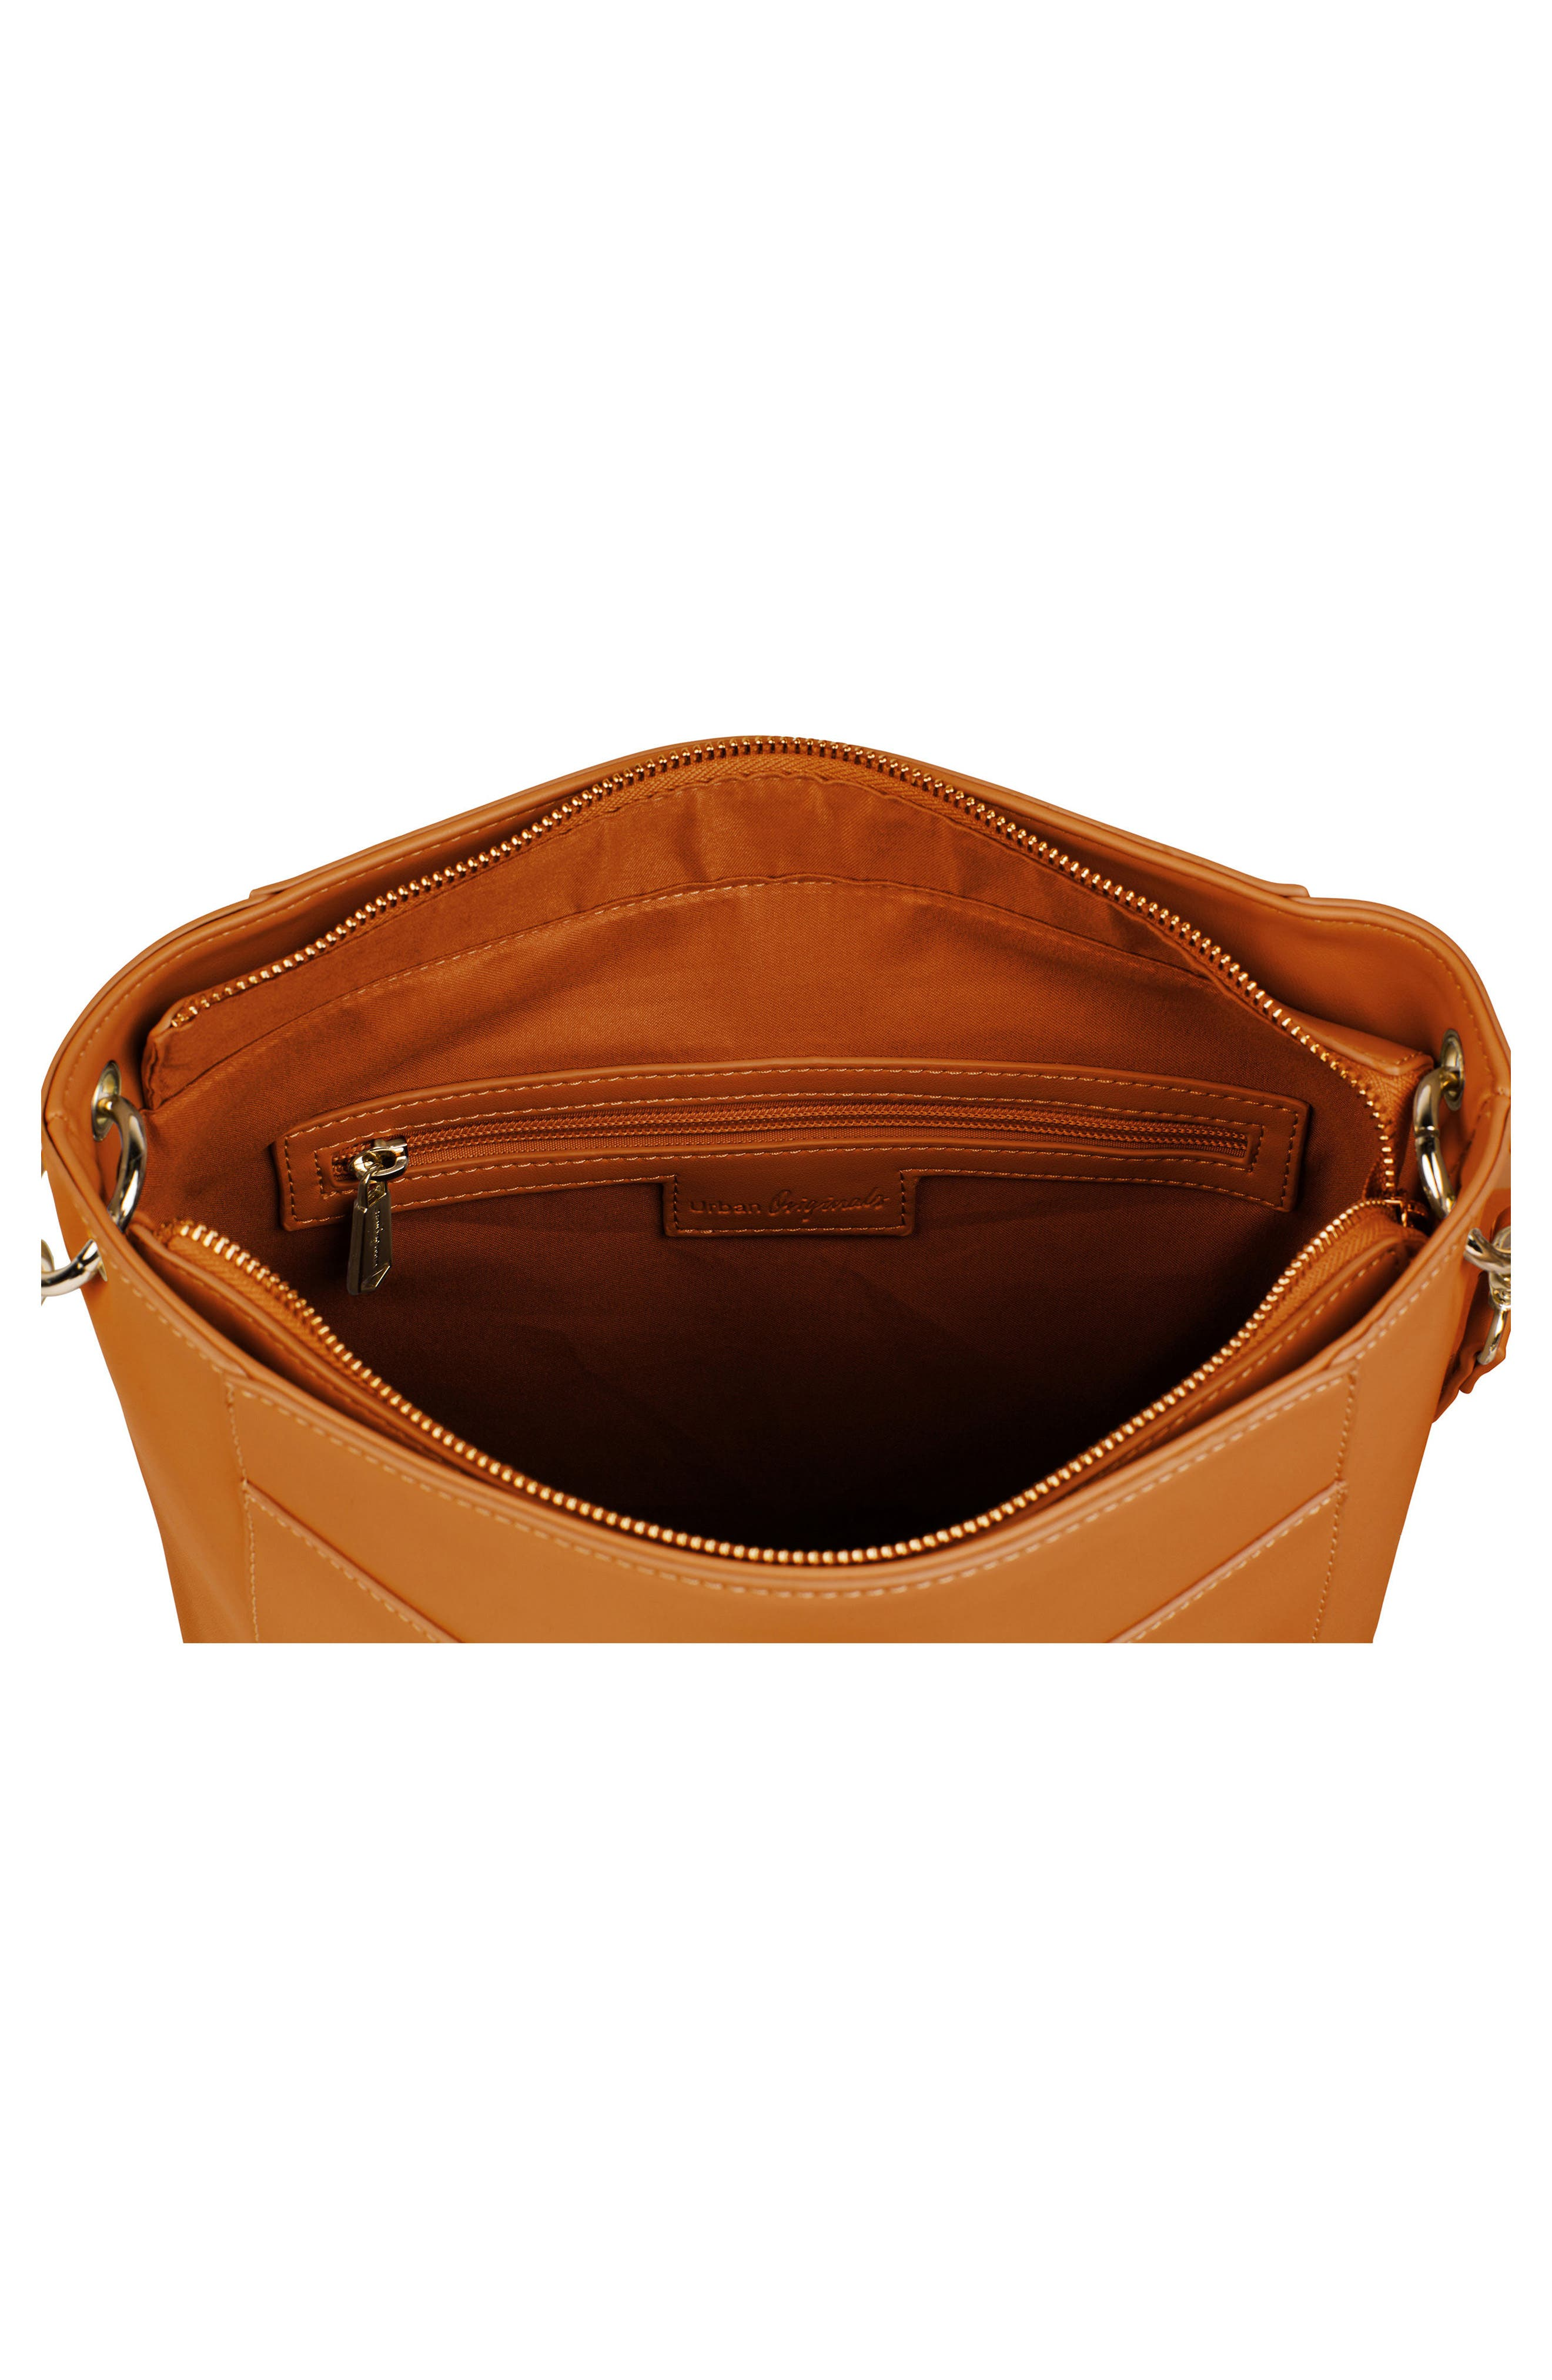 Luminescent Vegan Leather Crossbody Bag,                             Alternate thumbnail 2, color,                             Tan